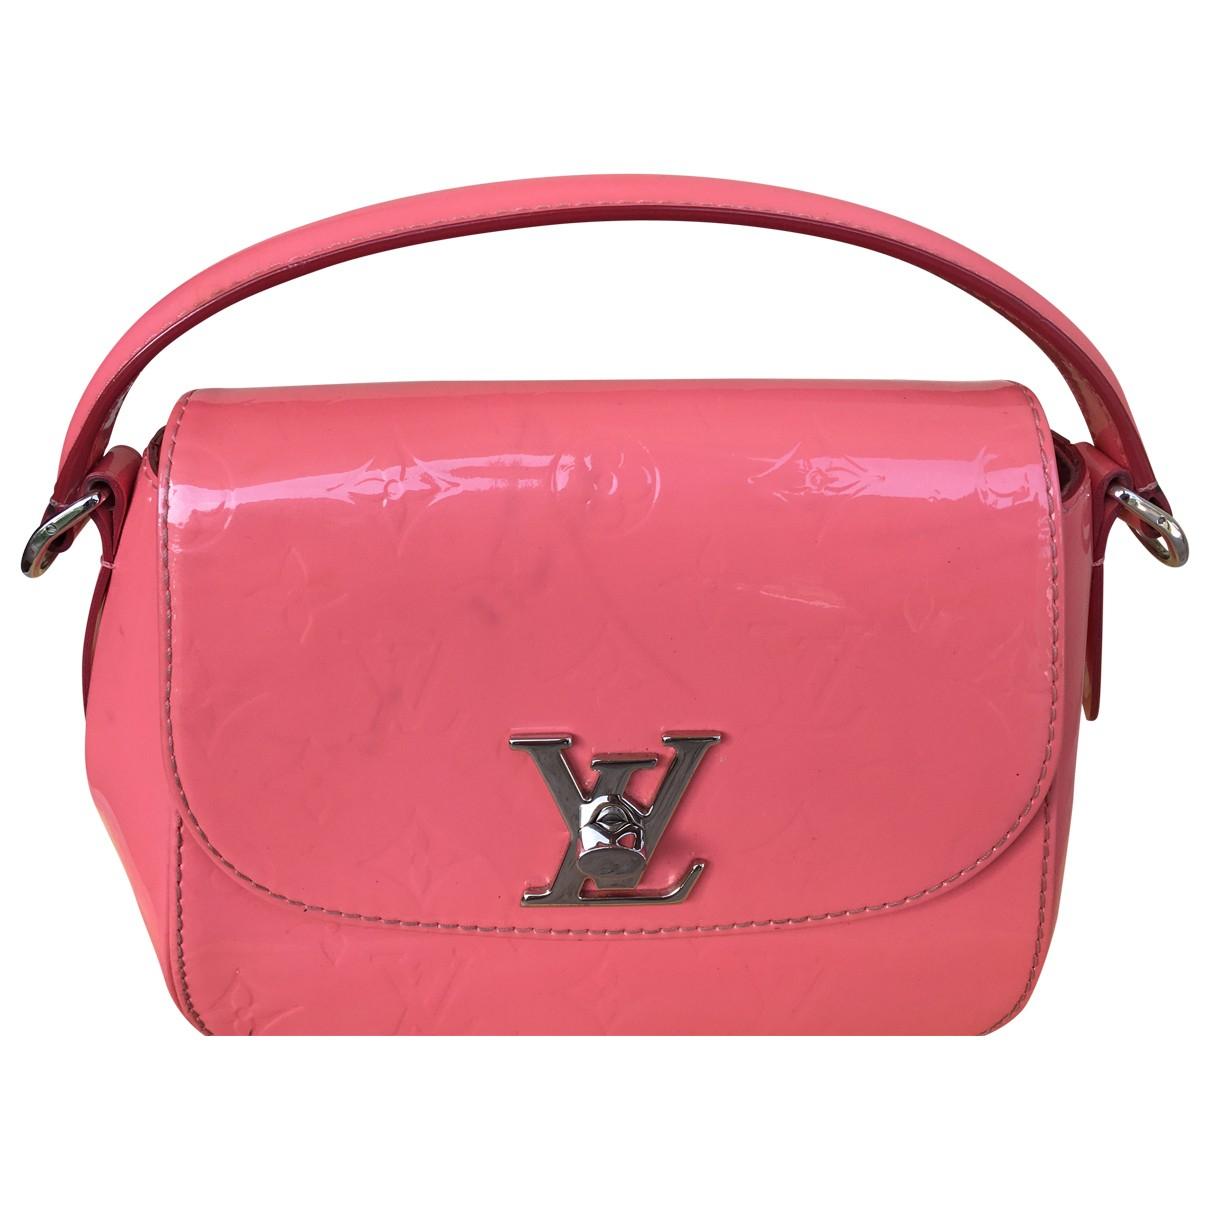 Louis Vuitton - Sac a main Pasadena pour femme en cuir verni - rose